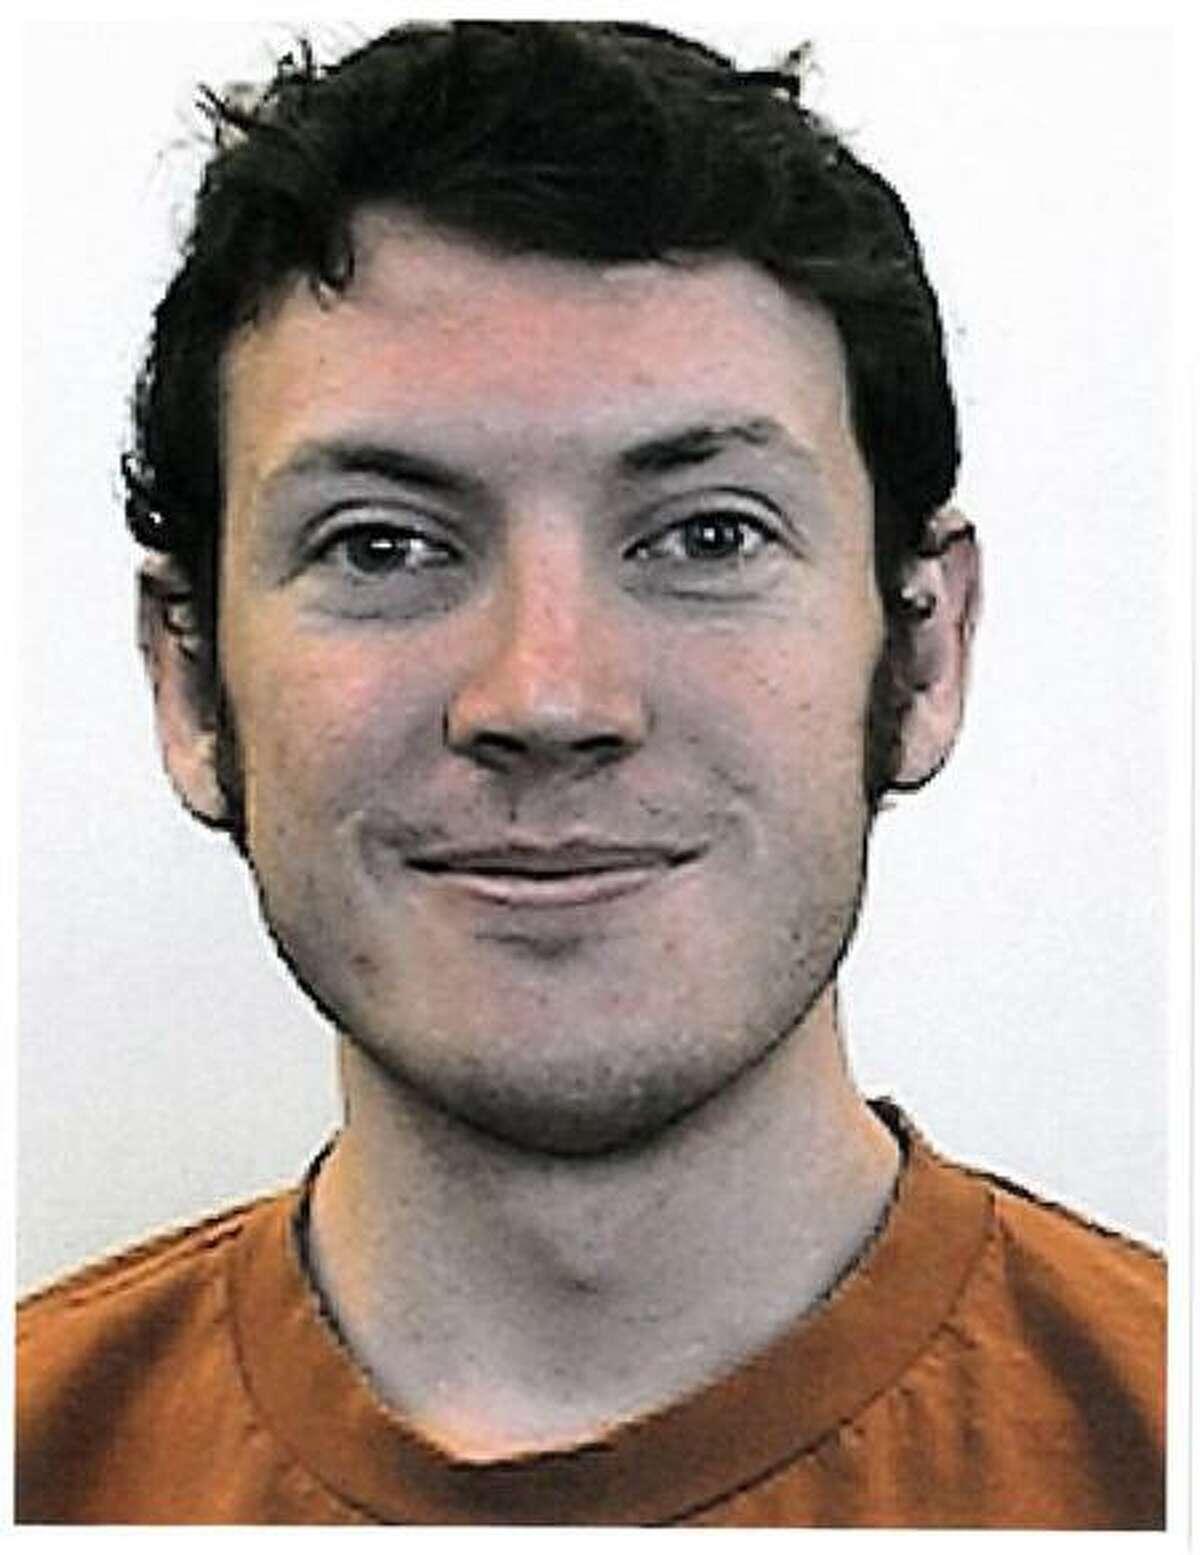 James Holmes. (AP Photo/University of Colorado)